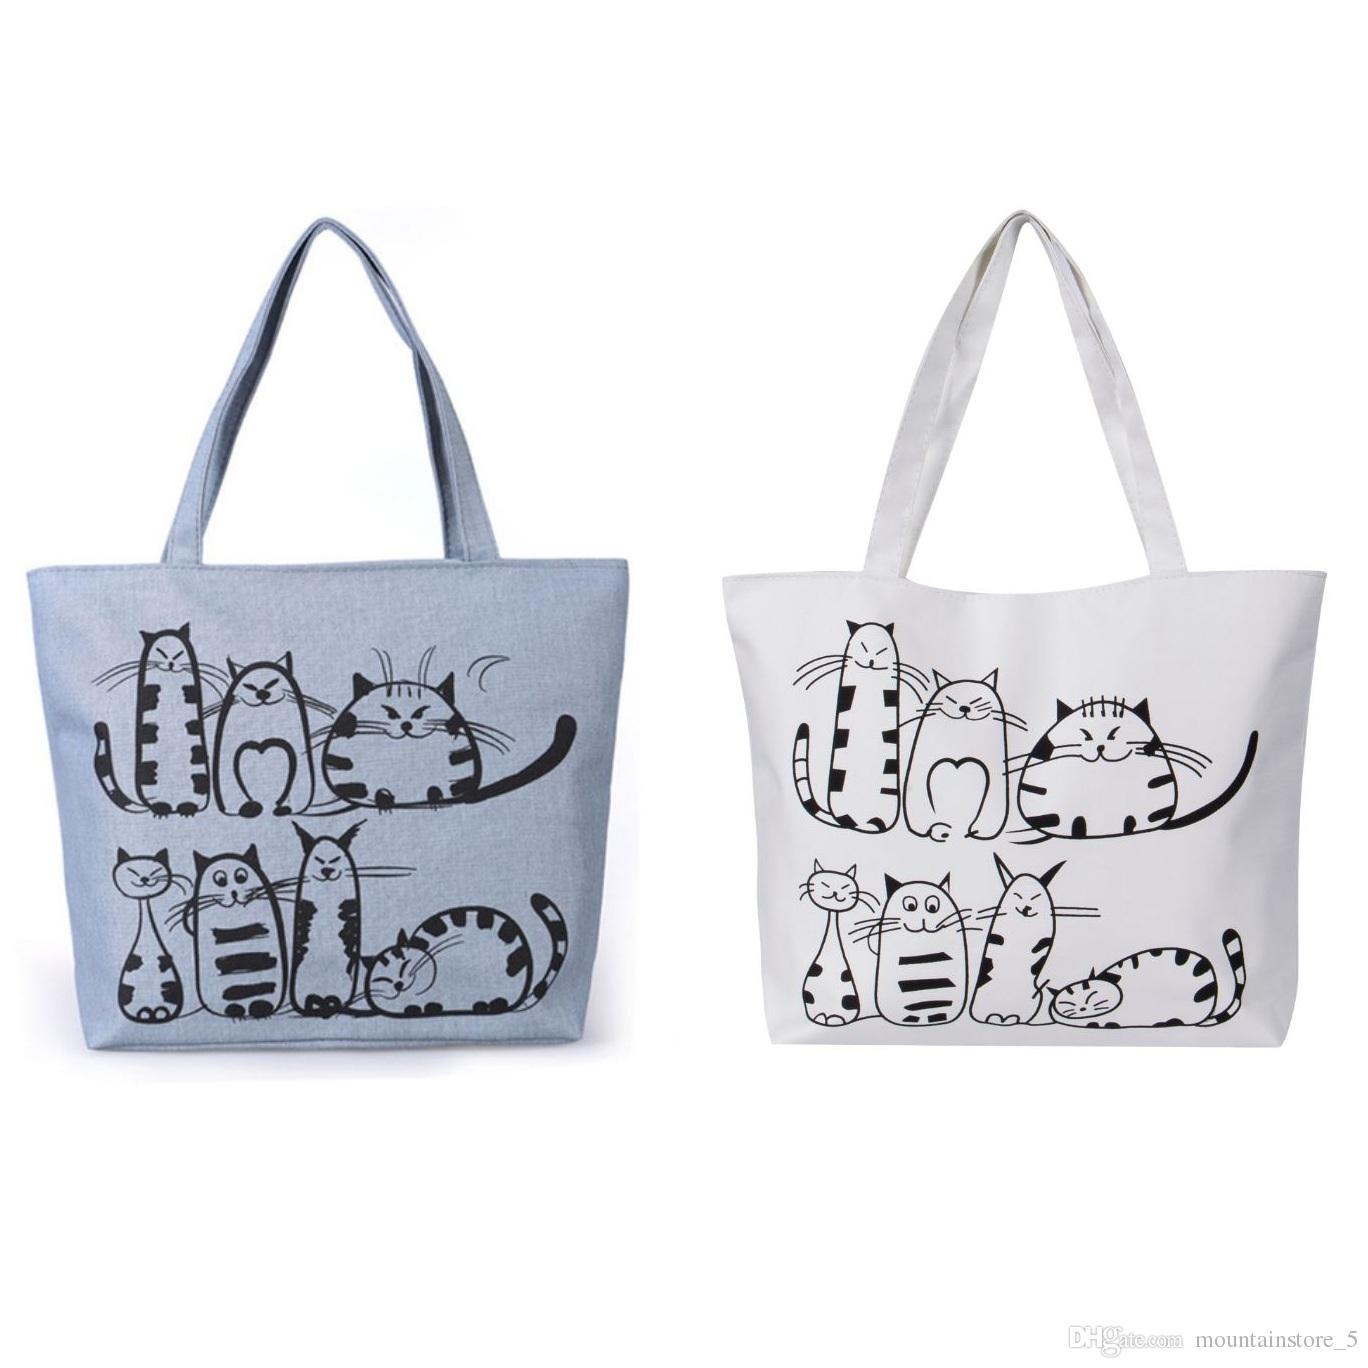 Hot Women Canvas Handbag Cartoon Cat Printed Shoulder Bag Female Large  Capacity Ladies Beach Bag Women Canvas Tote Shopping Handbags Satchel Messenger  Bags ... 0423c4e5dffa6